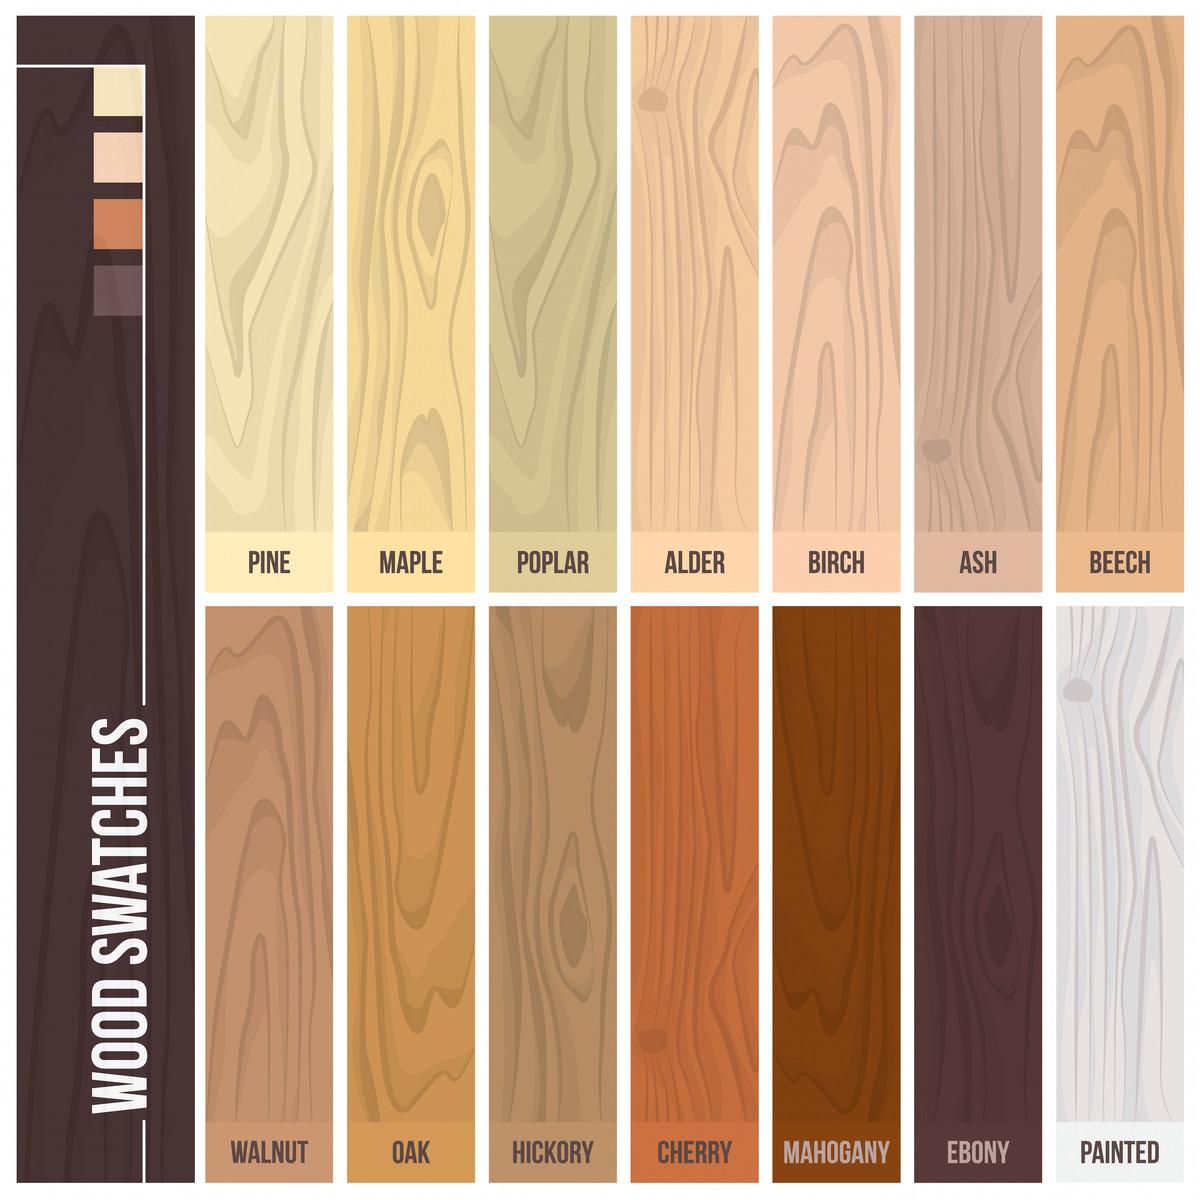 5 inch maple hardwood flooring of 12 types of hardwood flooring species styles edging dimensions pertaining to types of hardwood flooring illustrated guide